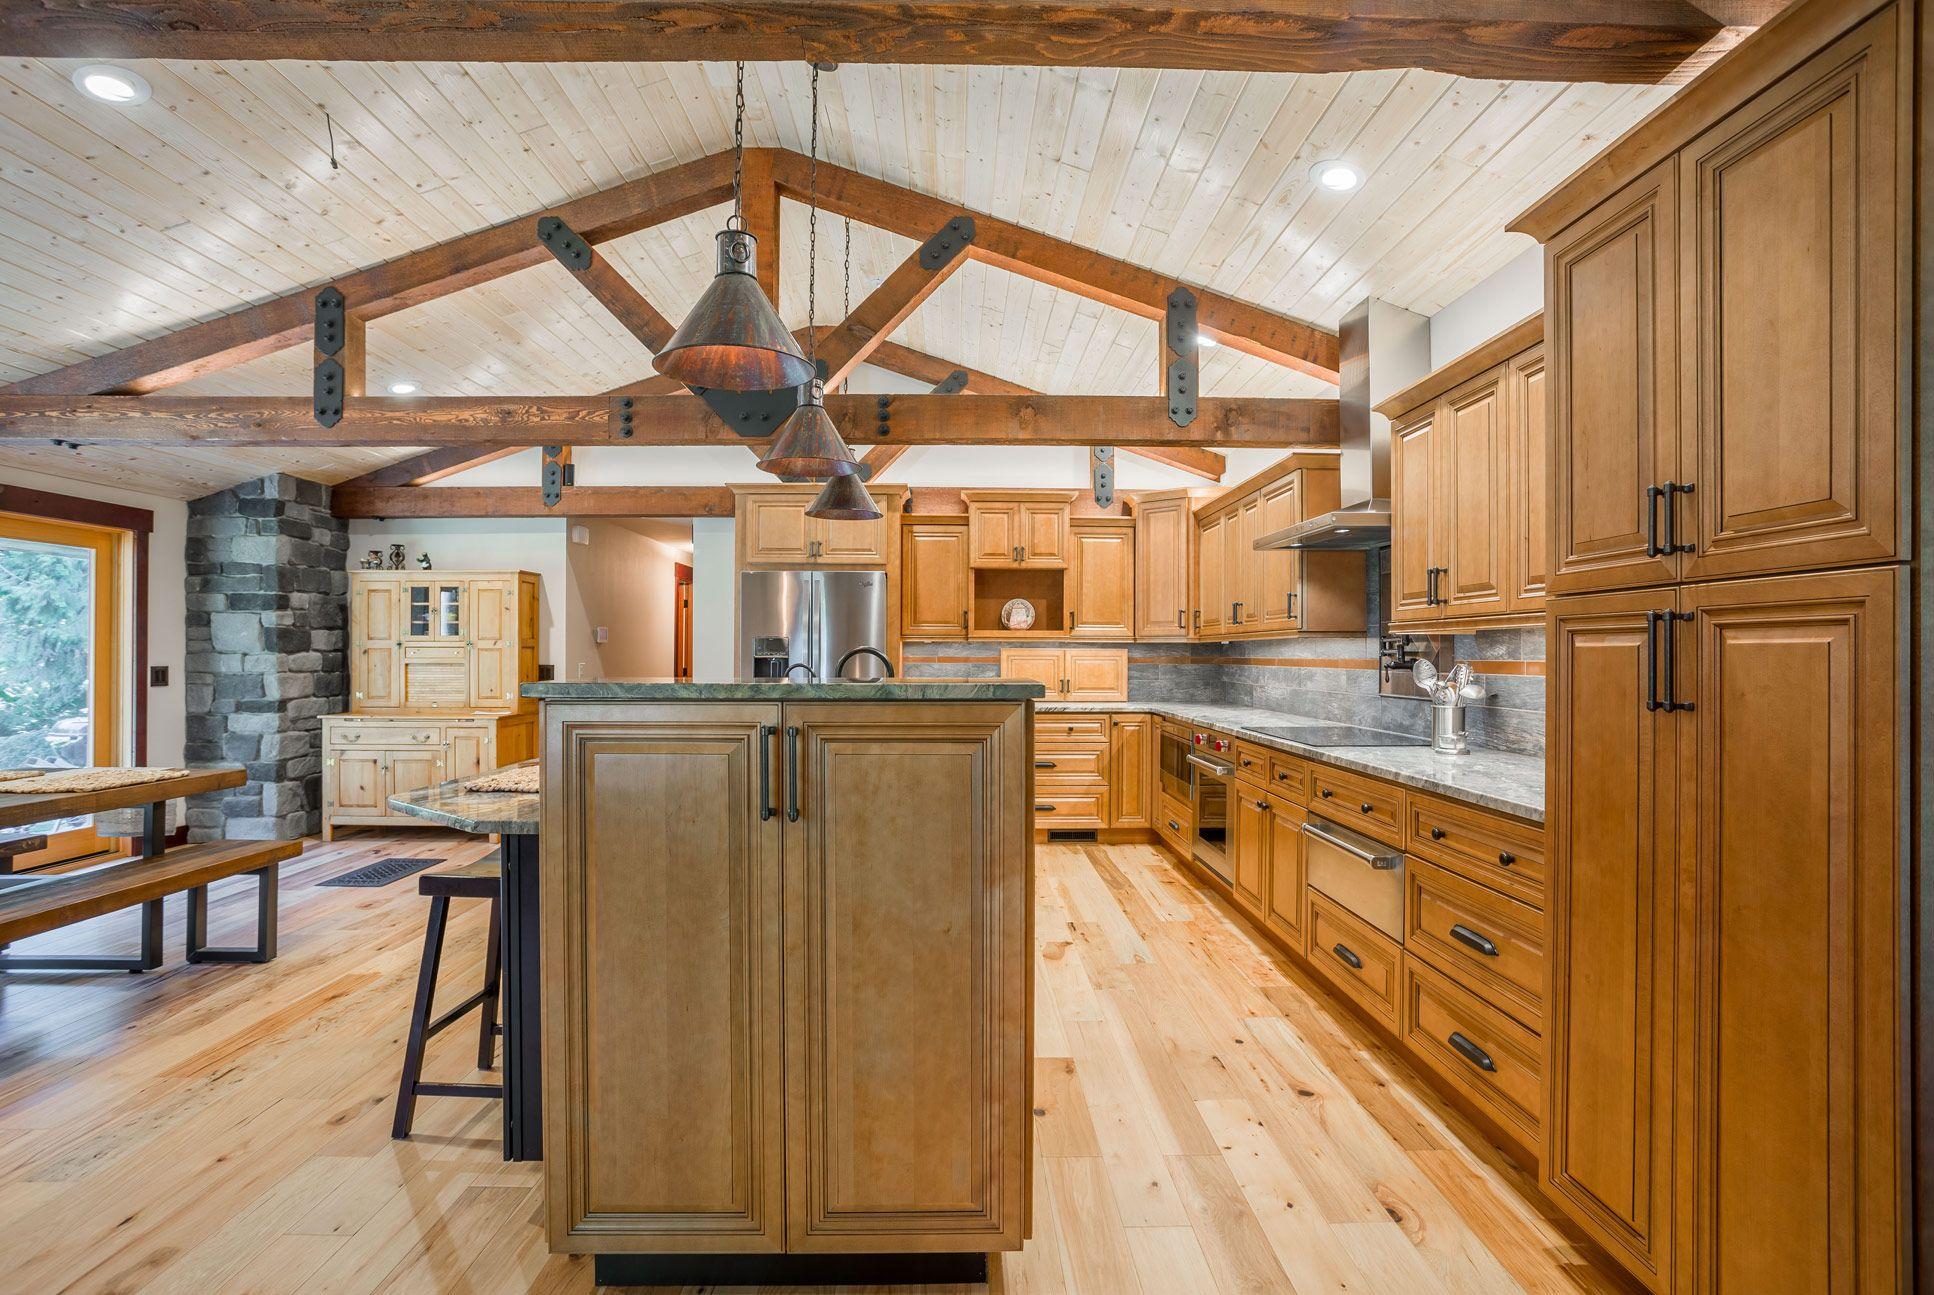 Home Cabinet Westbury Co66 Style Cinnamon Glazed Maple Kitchen Cabinets In 2020 Maple Kitchen Cabinets Maple Kitchen Kitchen